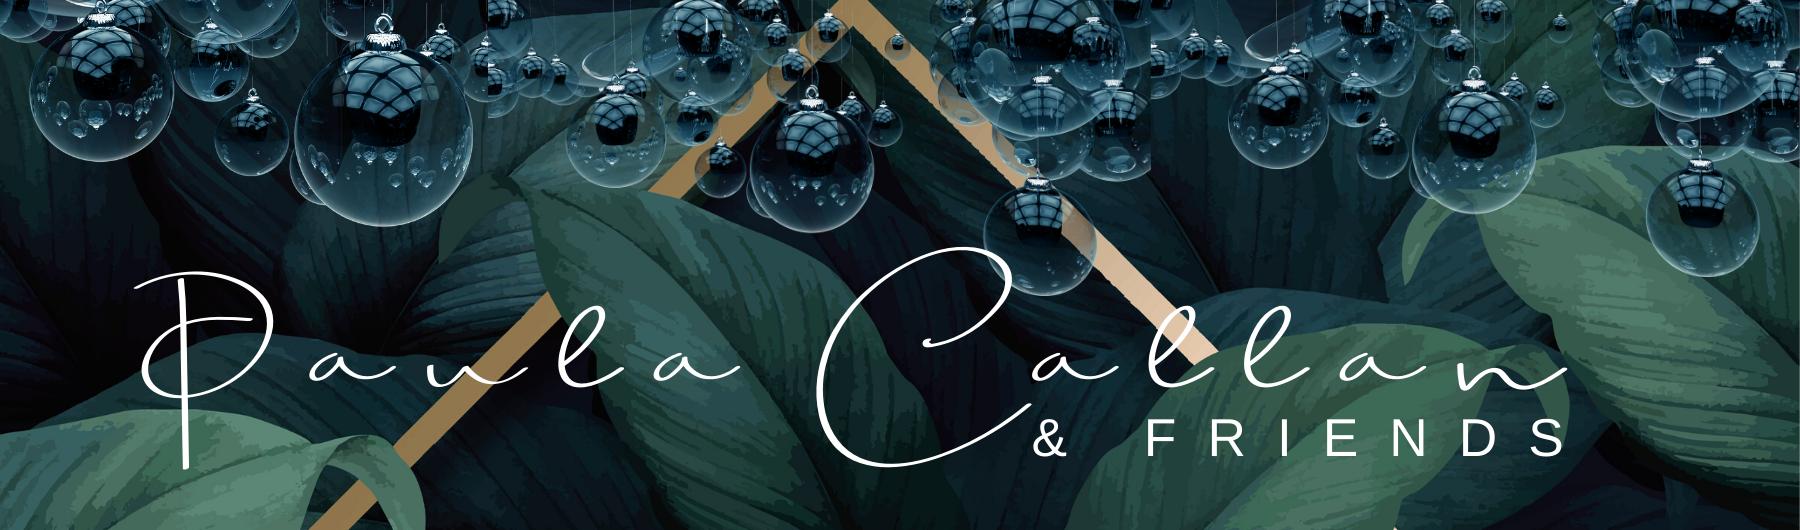 Paula Callan & Friends - A Christmas Special